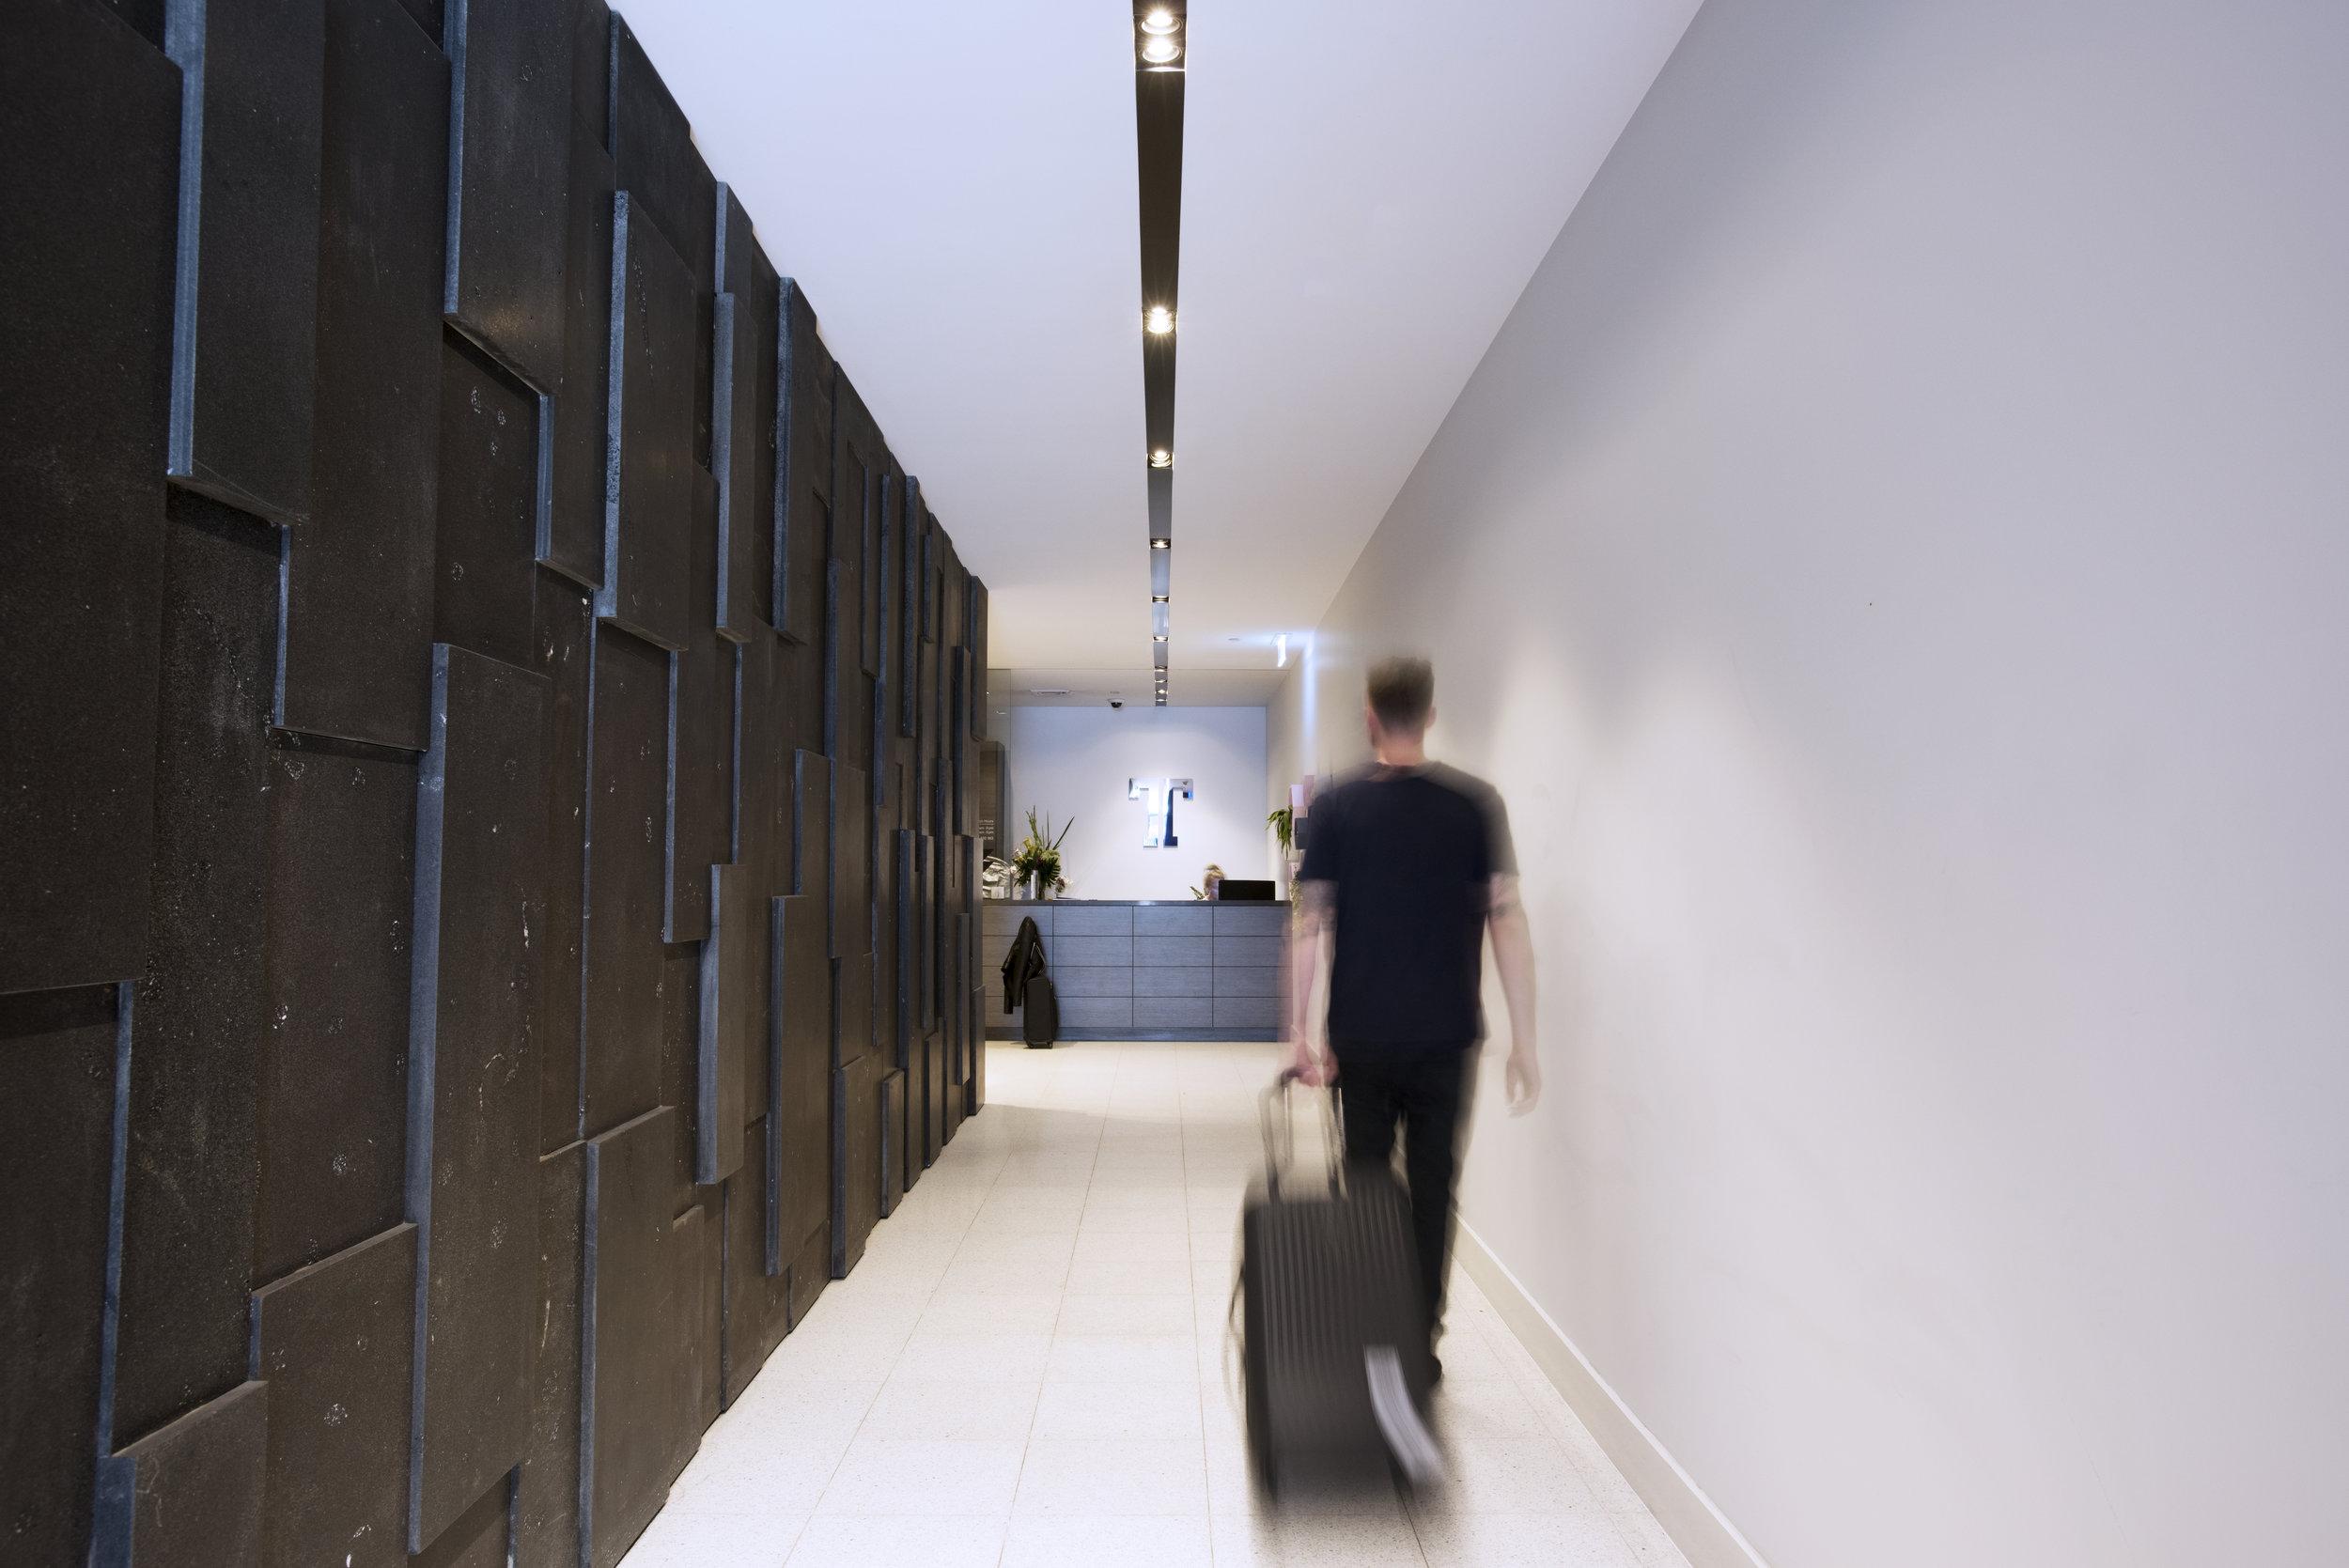 YOKE_Tyrian Apartments0047.jpg